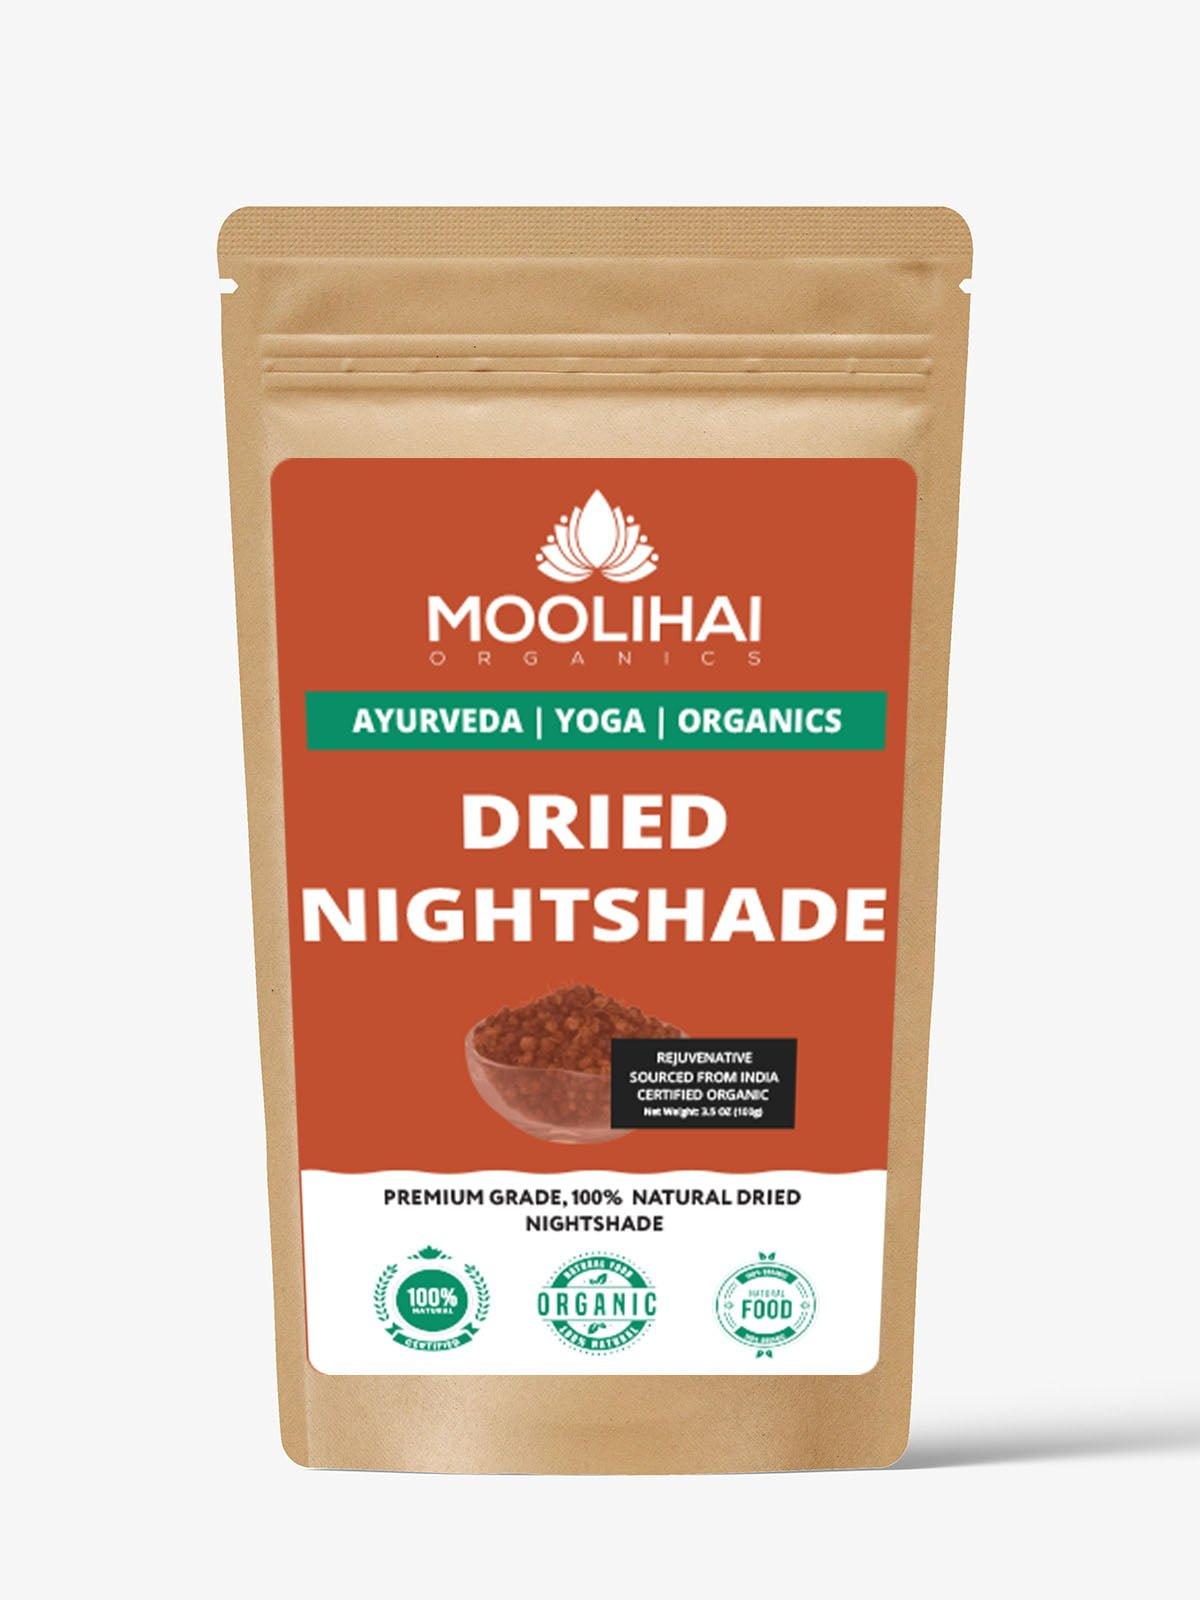 Dried NightShade